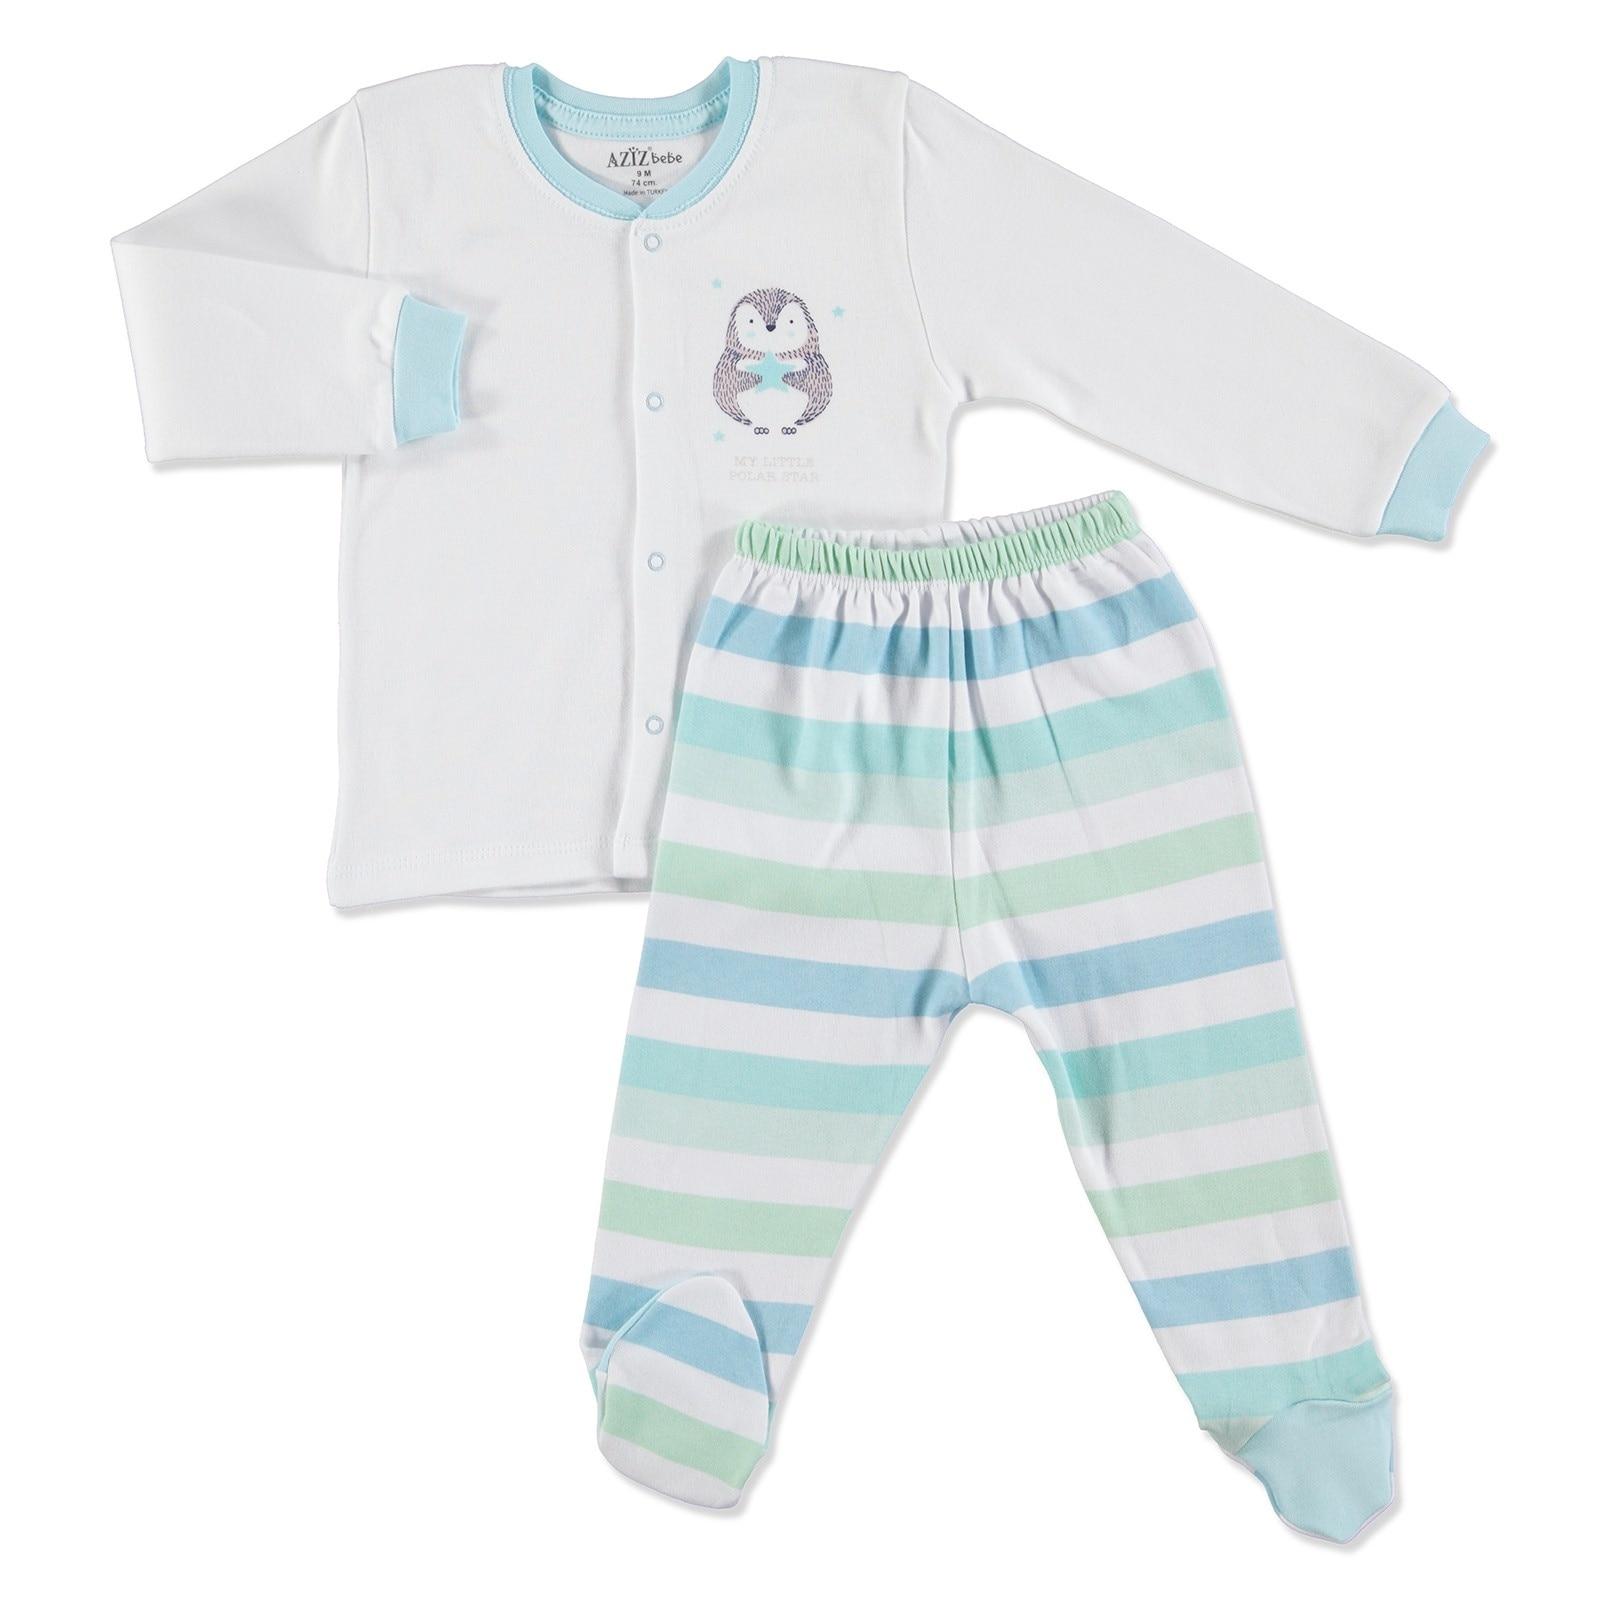 Ebebek Aziz Bebe Stars Baby Snaps Cardigan Footed Pants 2 Pcs